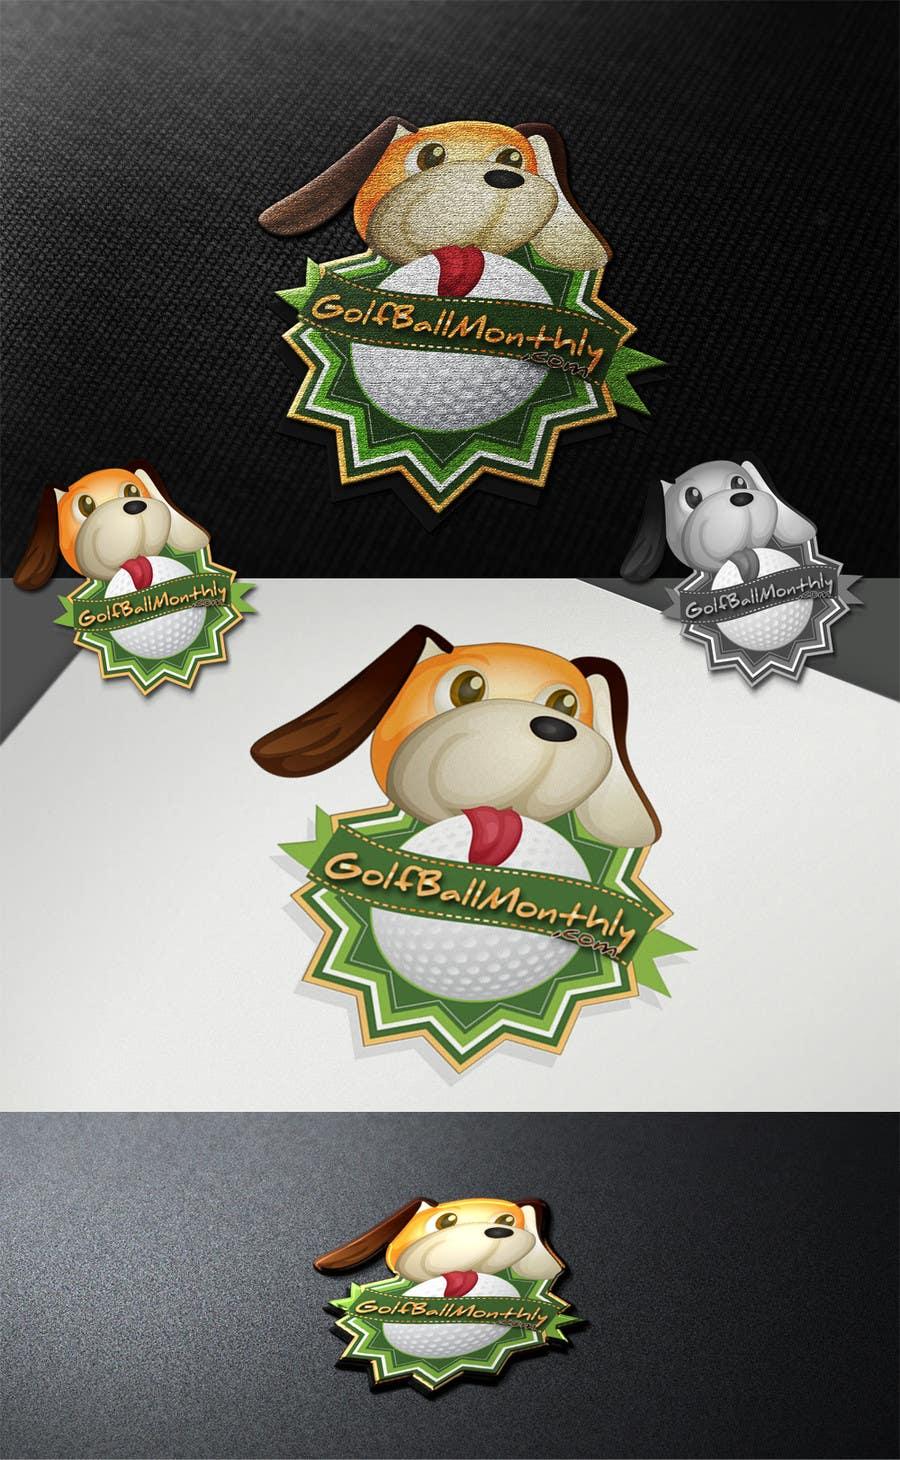 Konkurrenceindlæg #160 for Logo Design for golfballmonthly.com